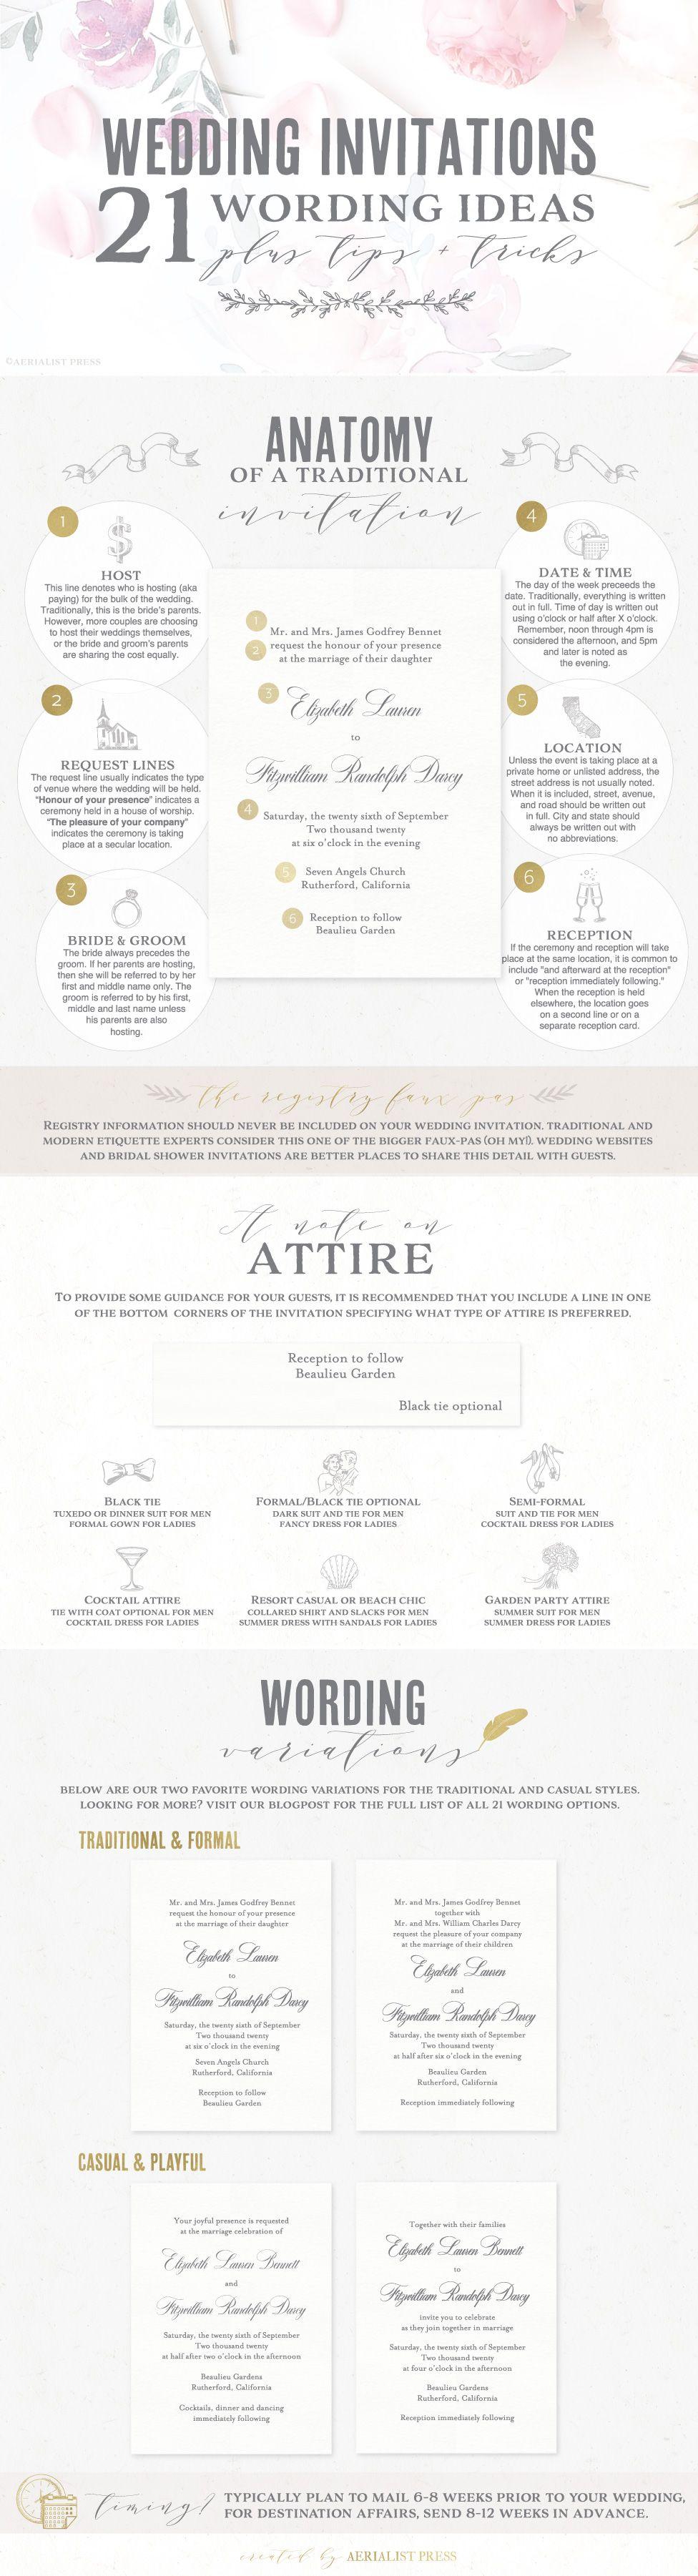 21 Best Wedding Invitation Wording Ideas